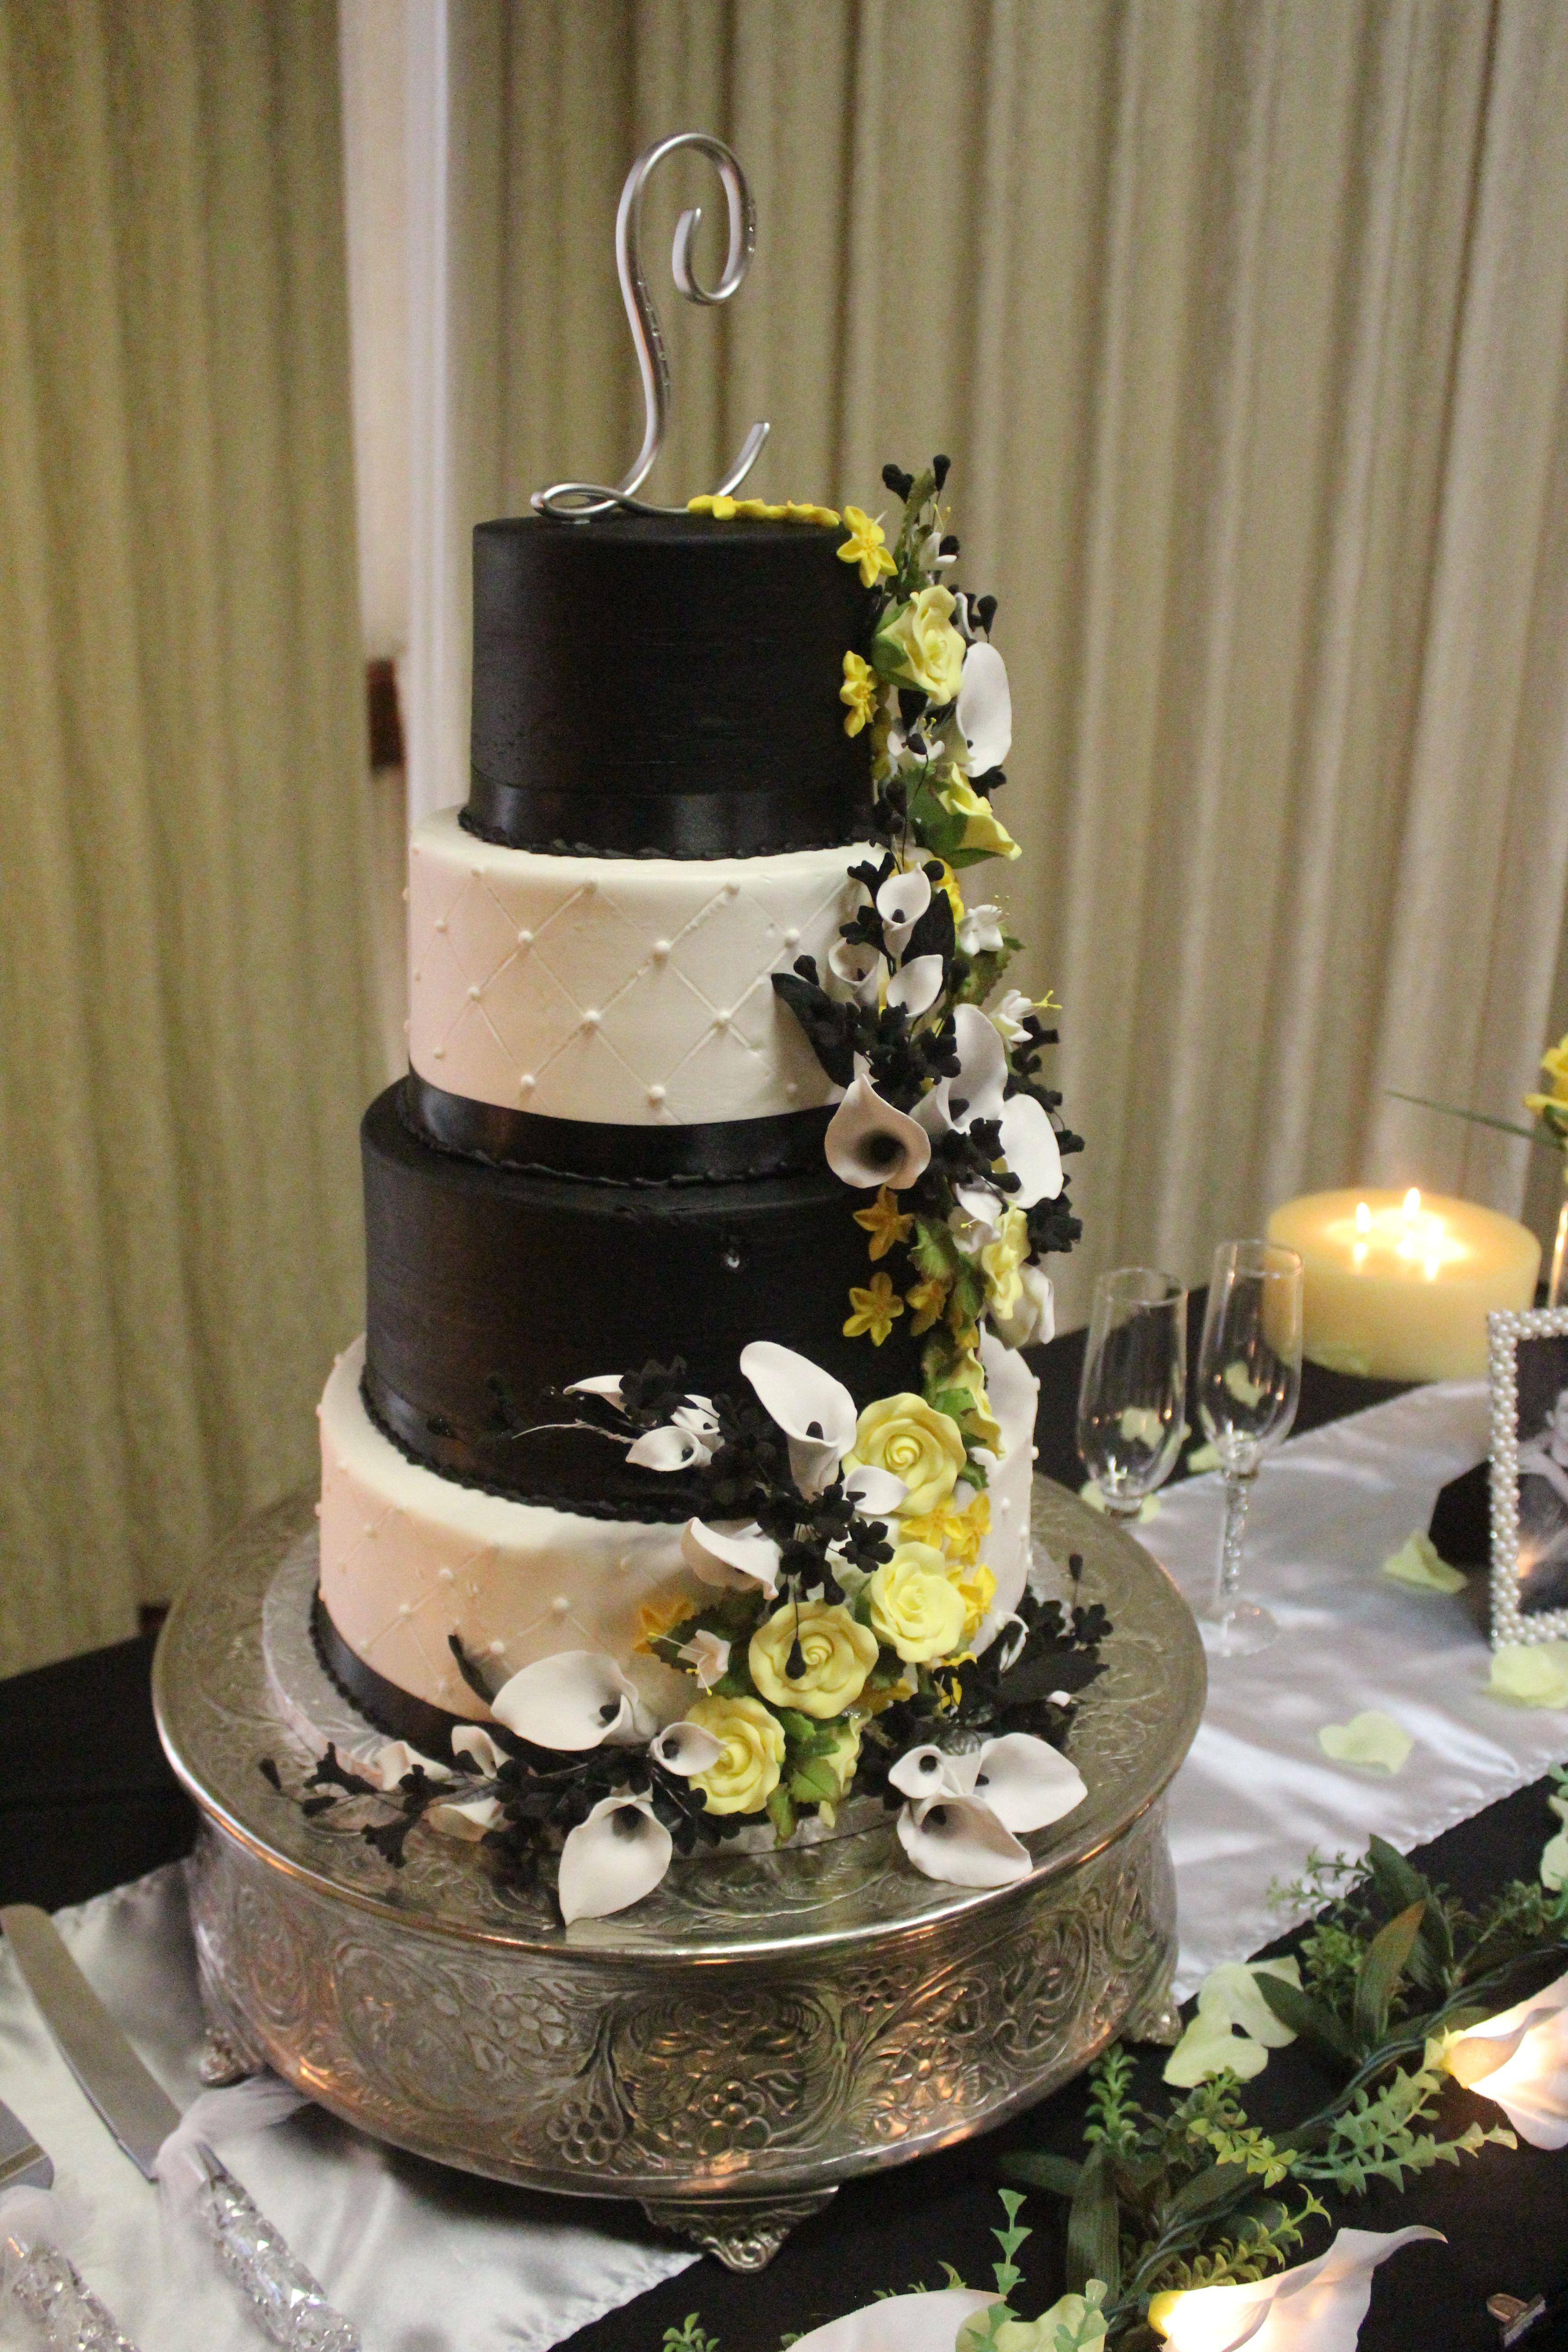 Awesome wedding cake blackwhite and yellow calla lillies